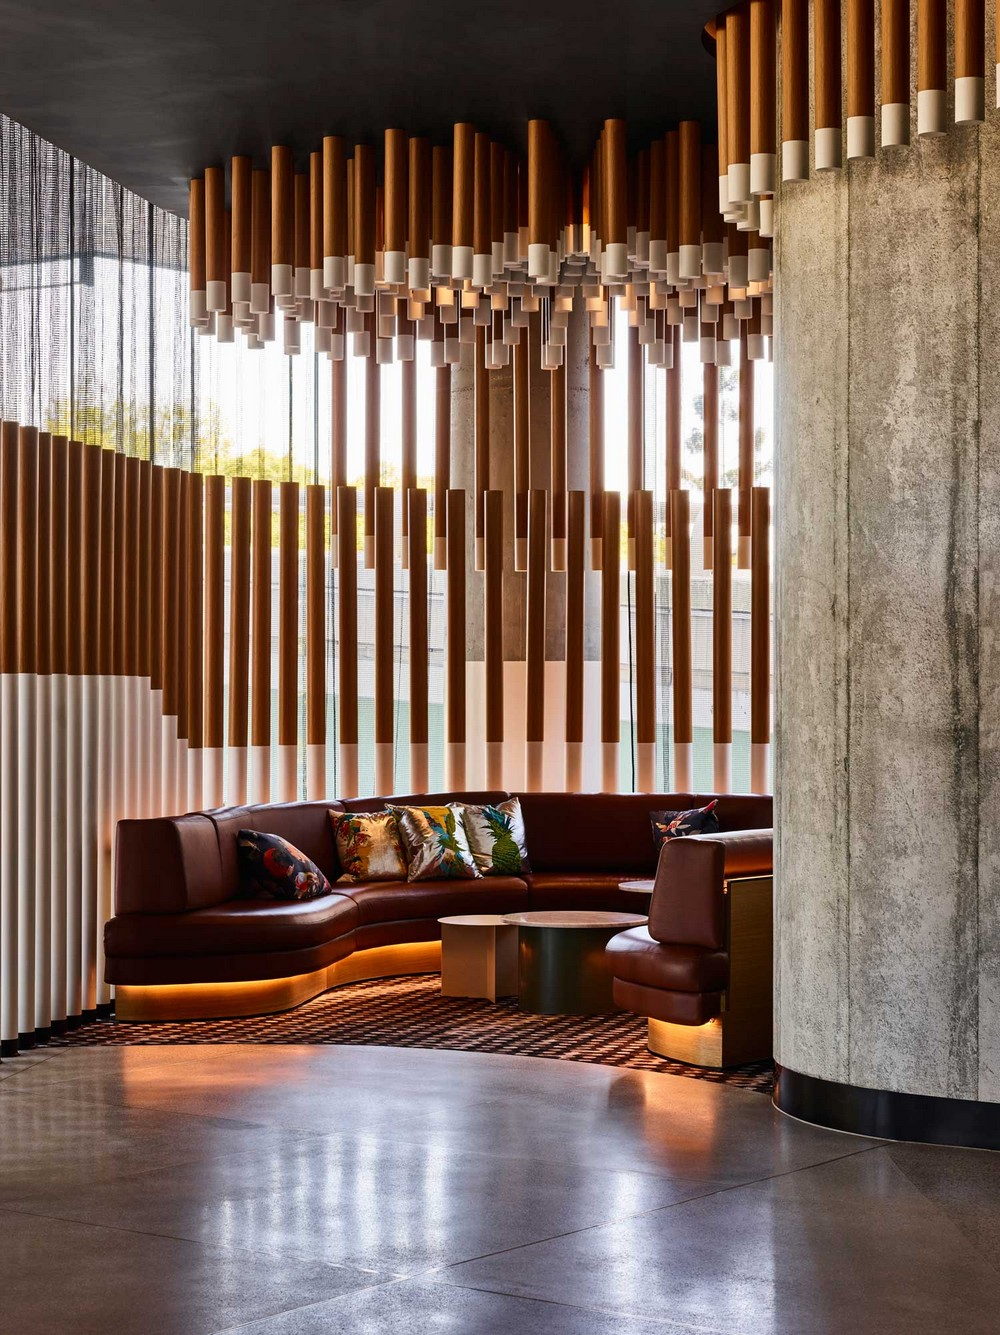 Top 20 Interior Designers From Sydney interior designers from sydney Top 20 Interior Designers From Sydney nic graham